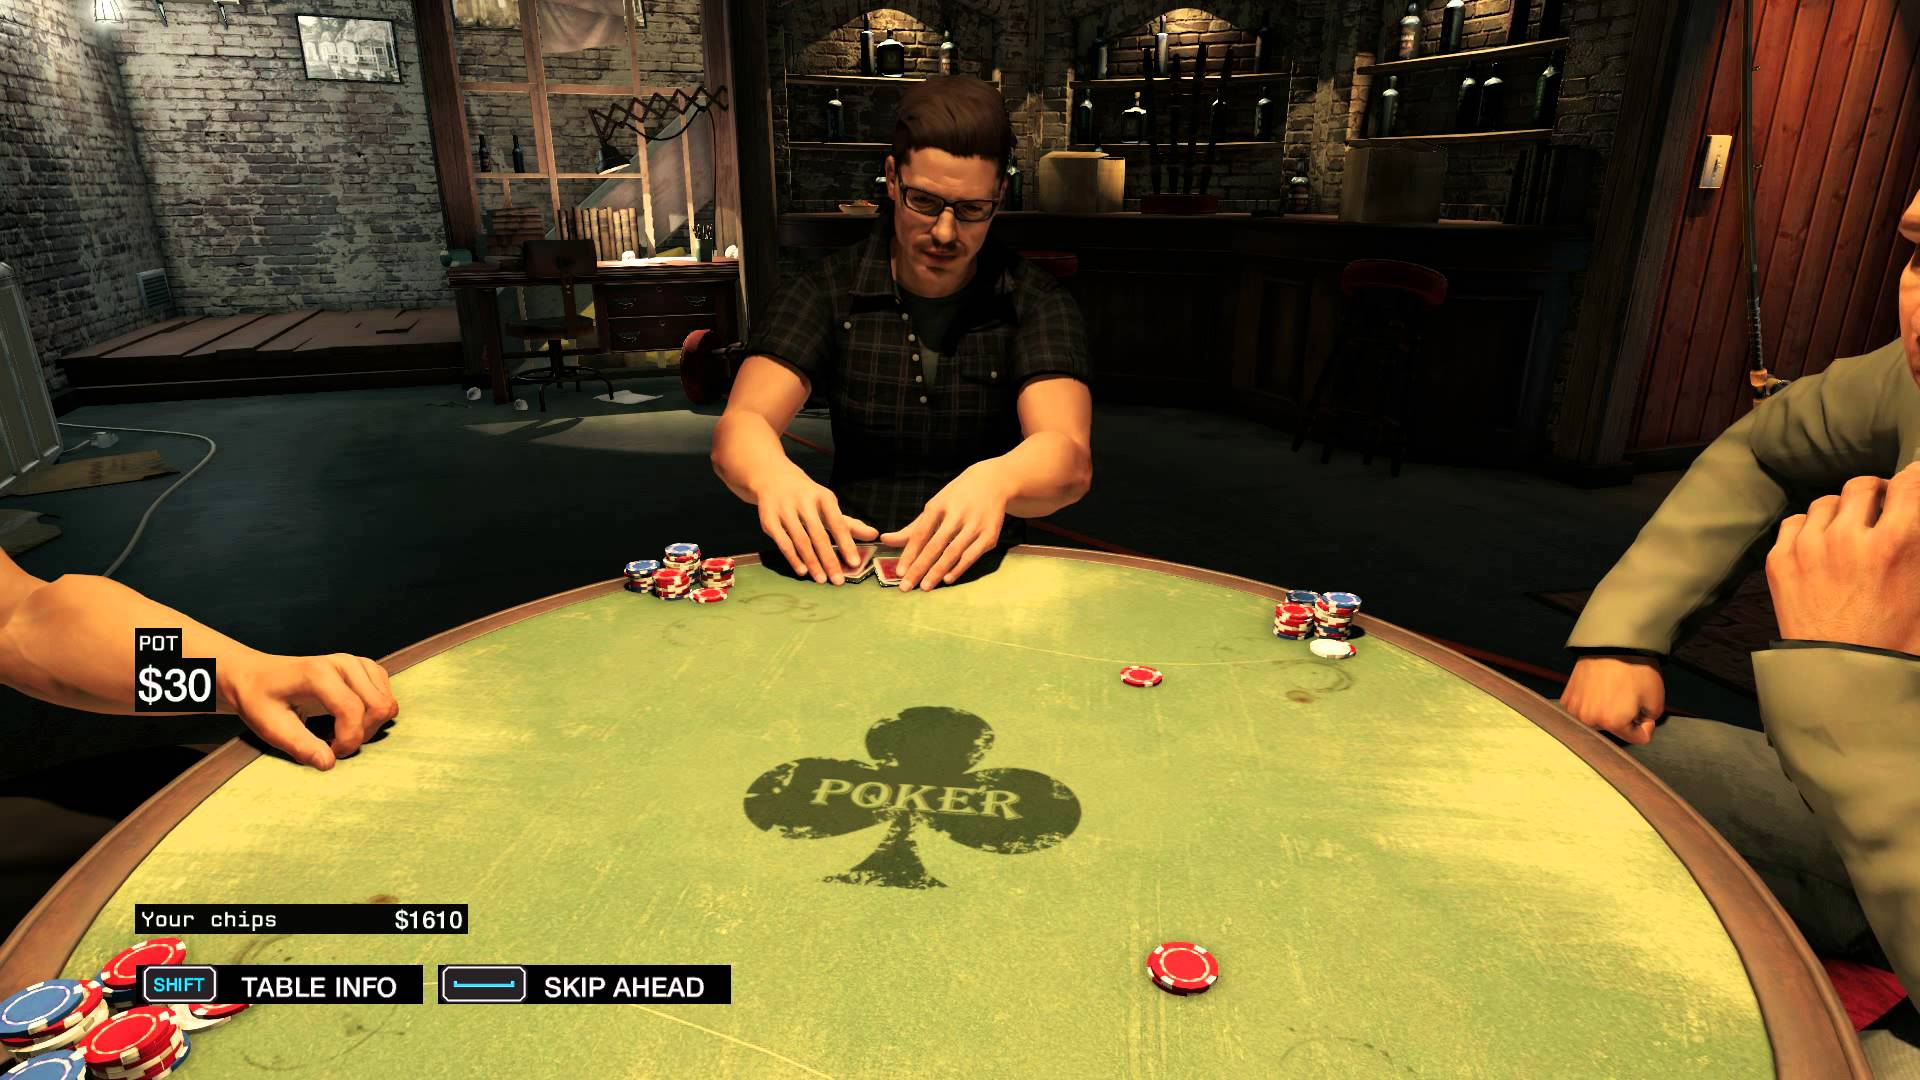 لعبه بوكر لعبة - 15162